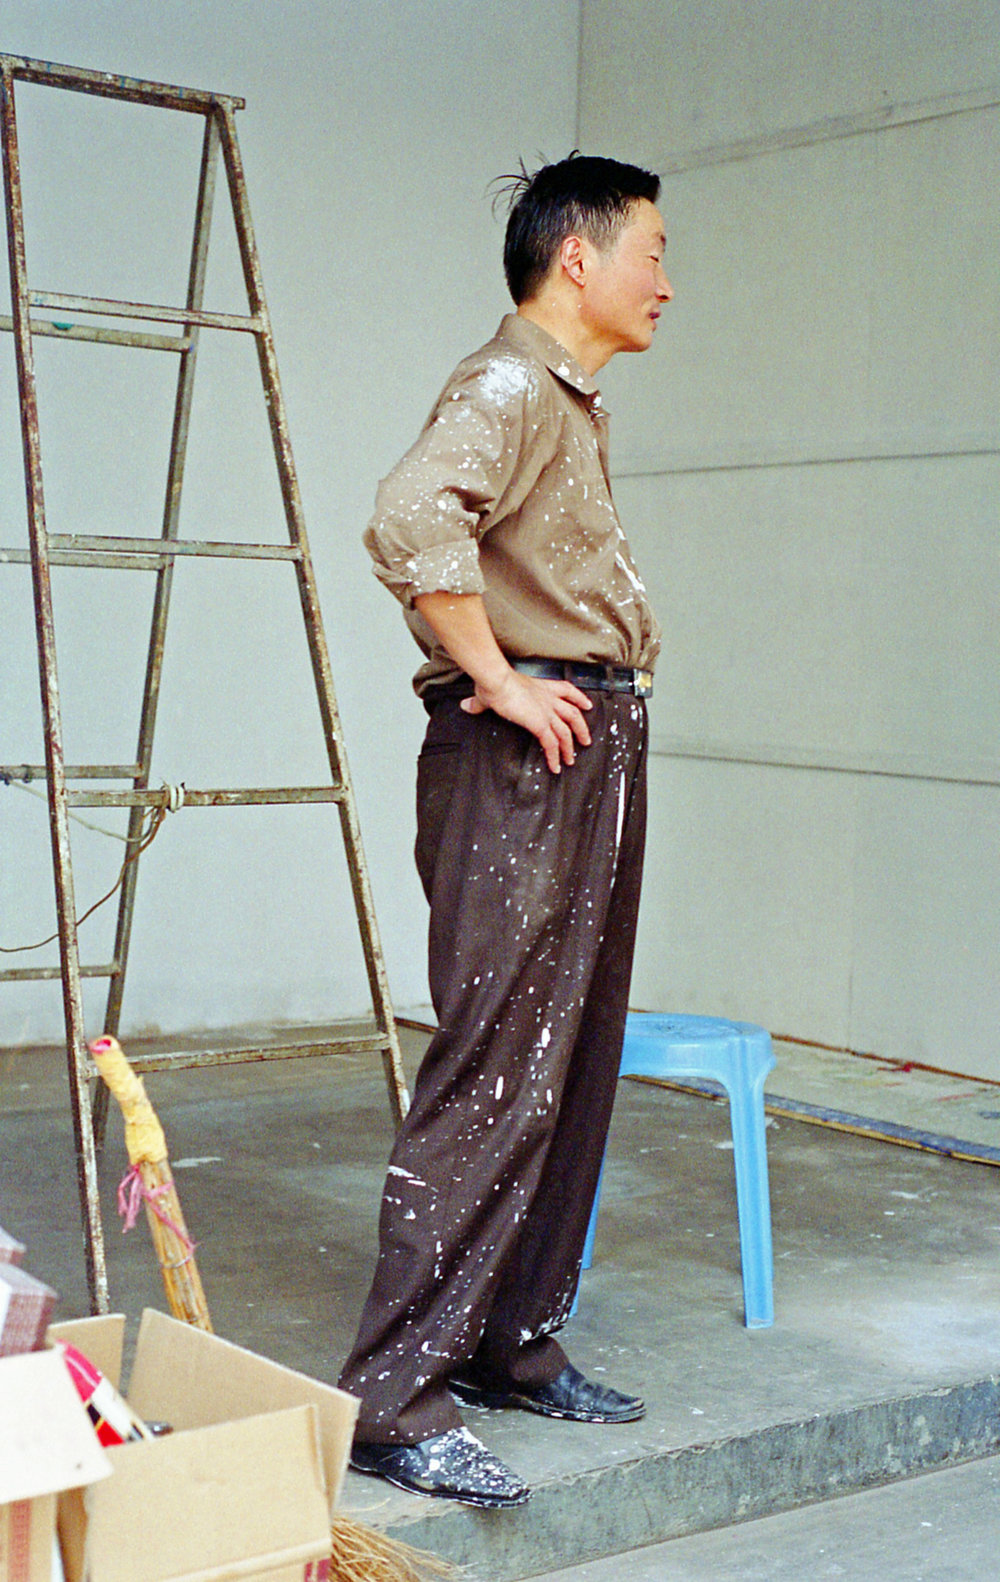 Man Painting, China.jpg